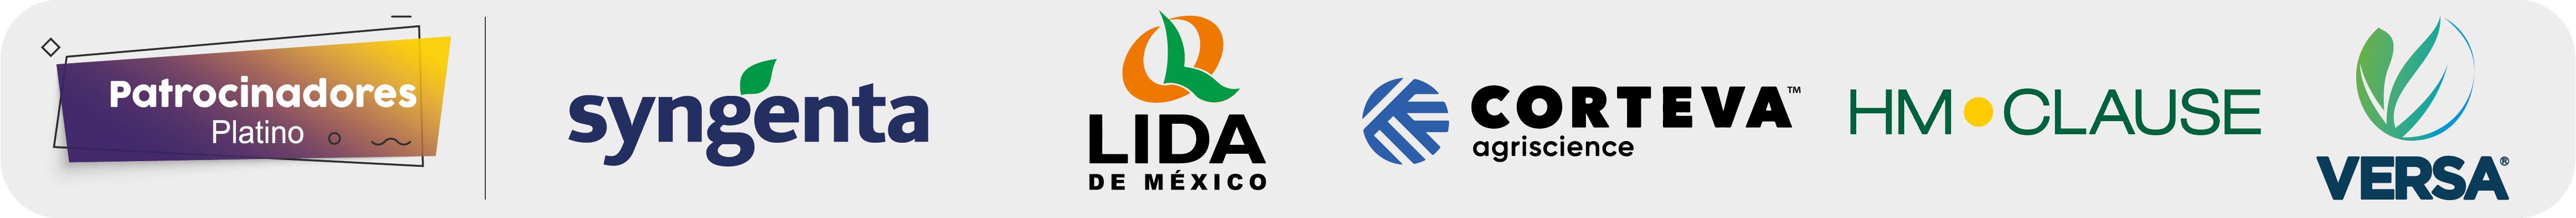 https://fitosanidad.com/wp-content/uploads/2019/07/Slide-Patrocinadores_3.png